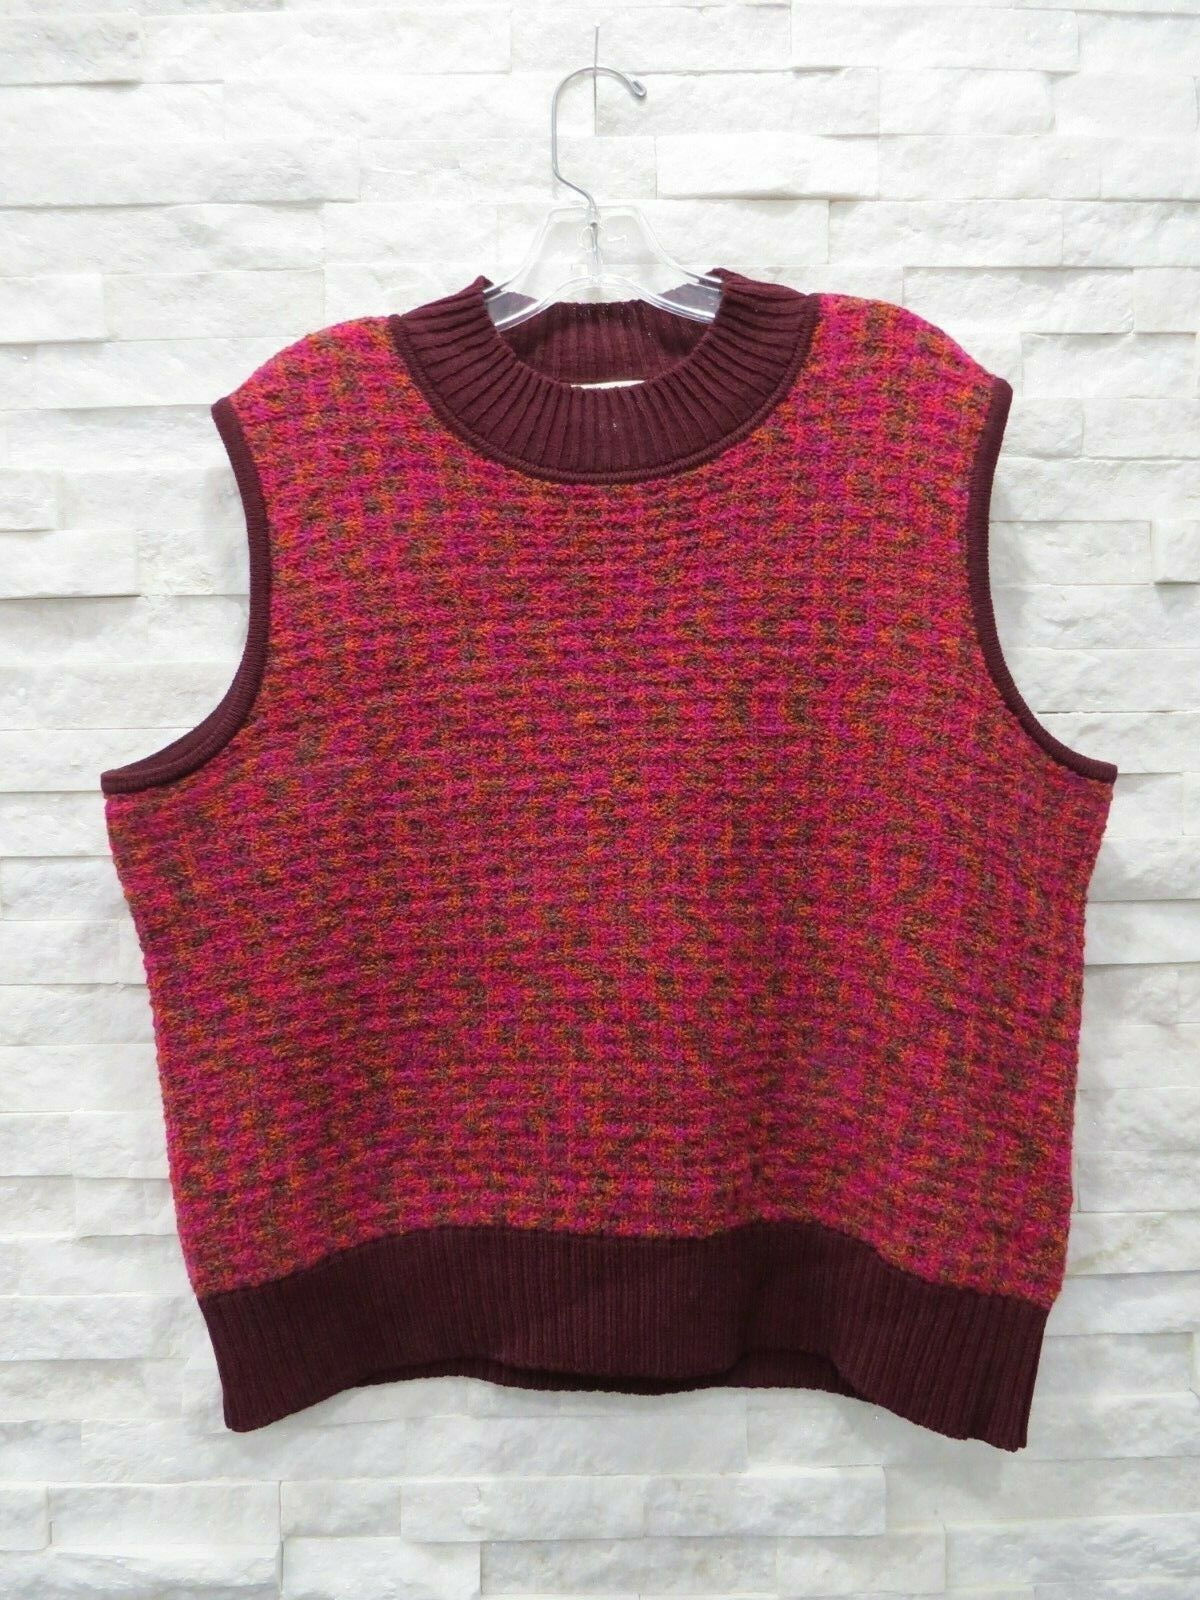 St. John Sport Maroon orange Brown Magenta Boucle Santana Knit Sweater XL 16 18